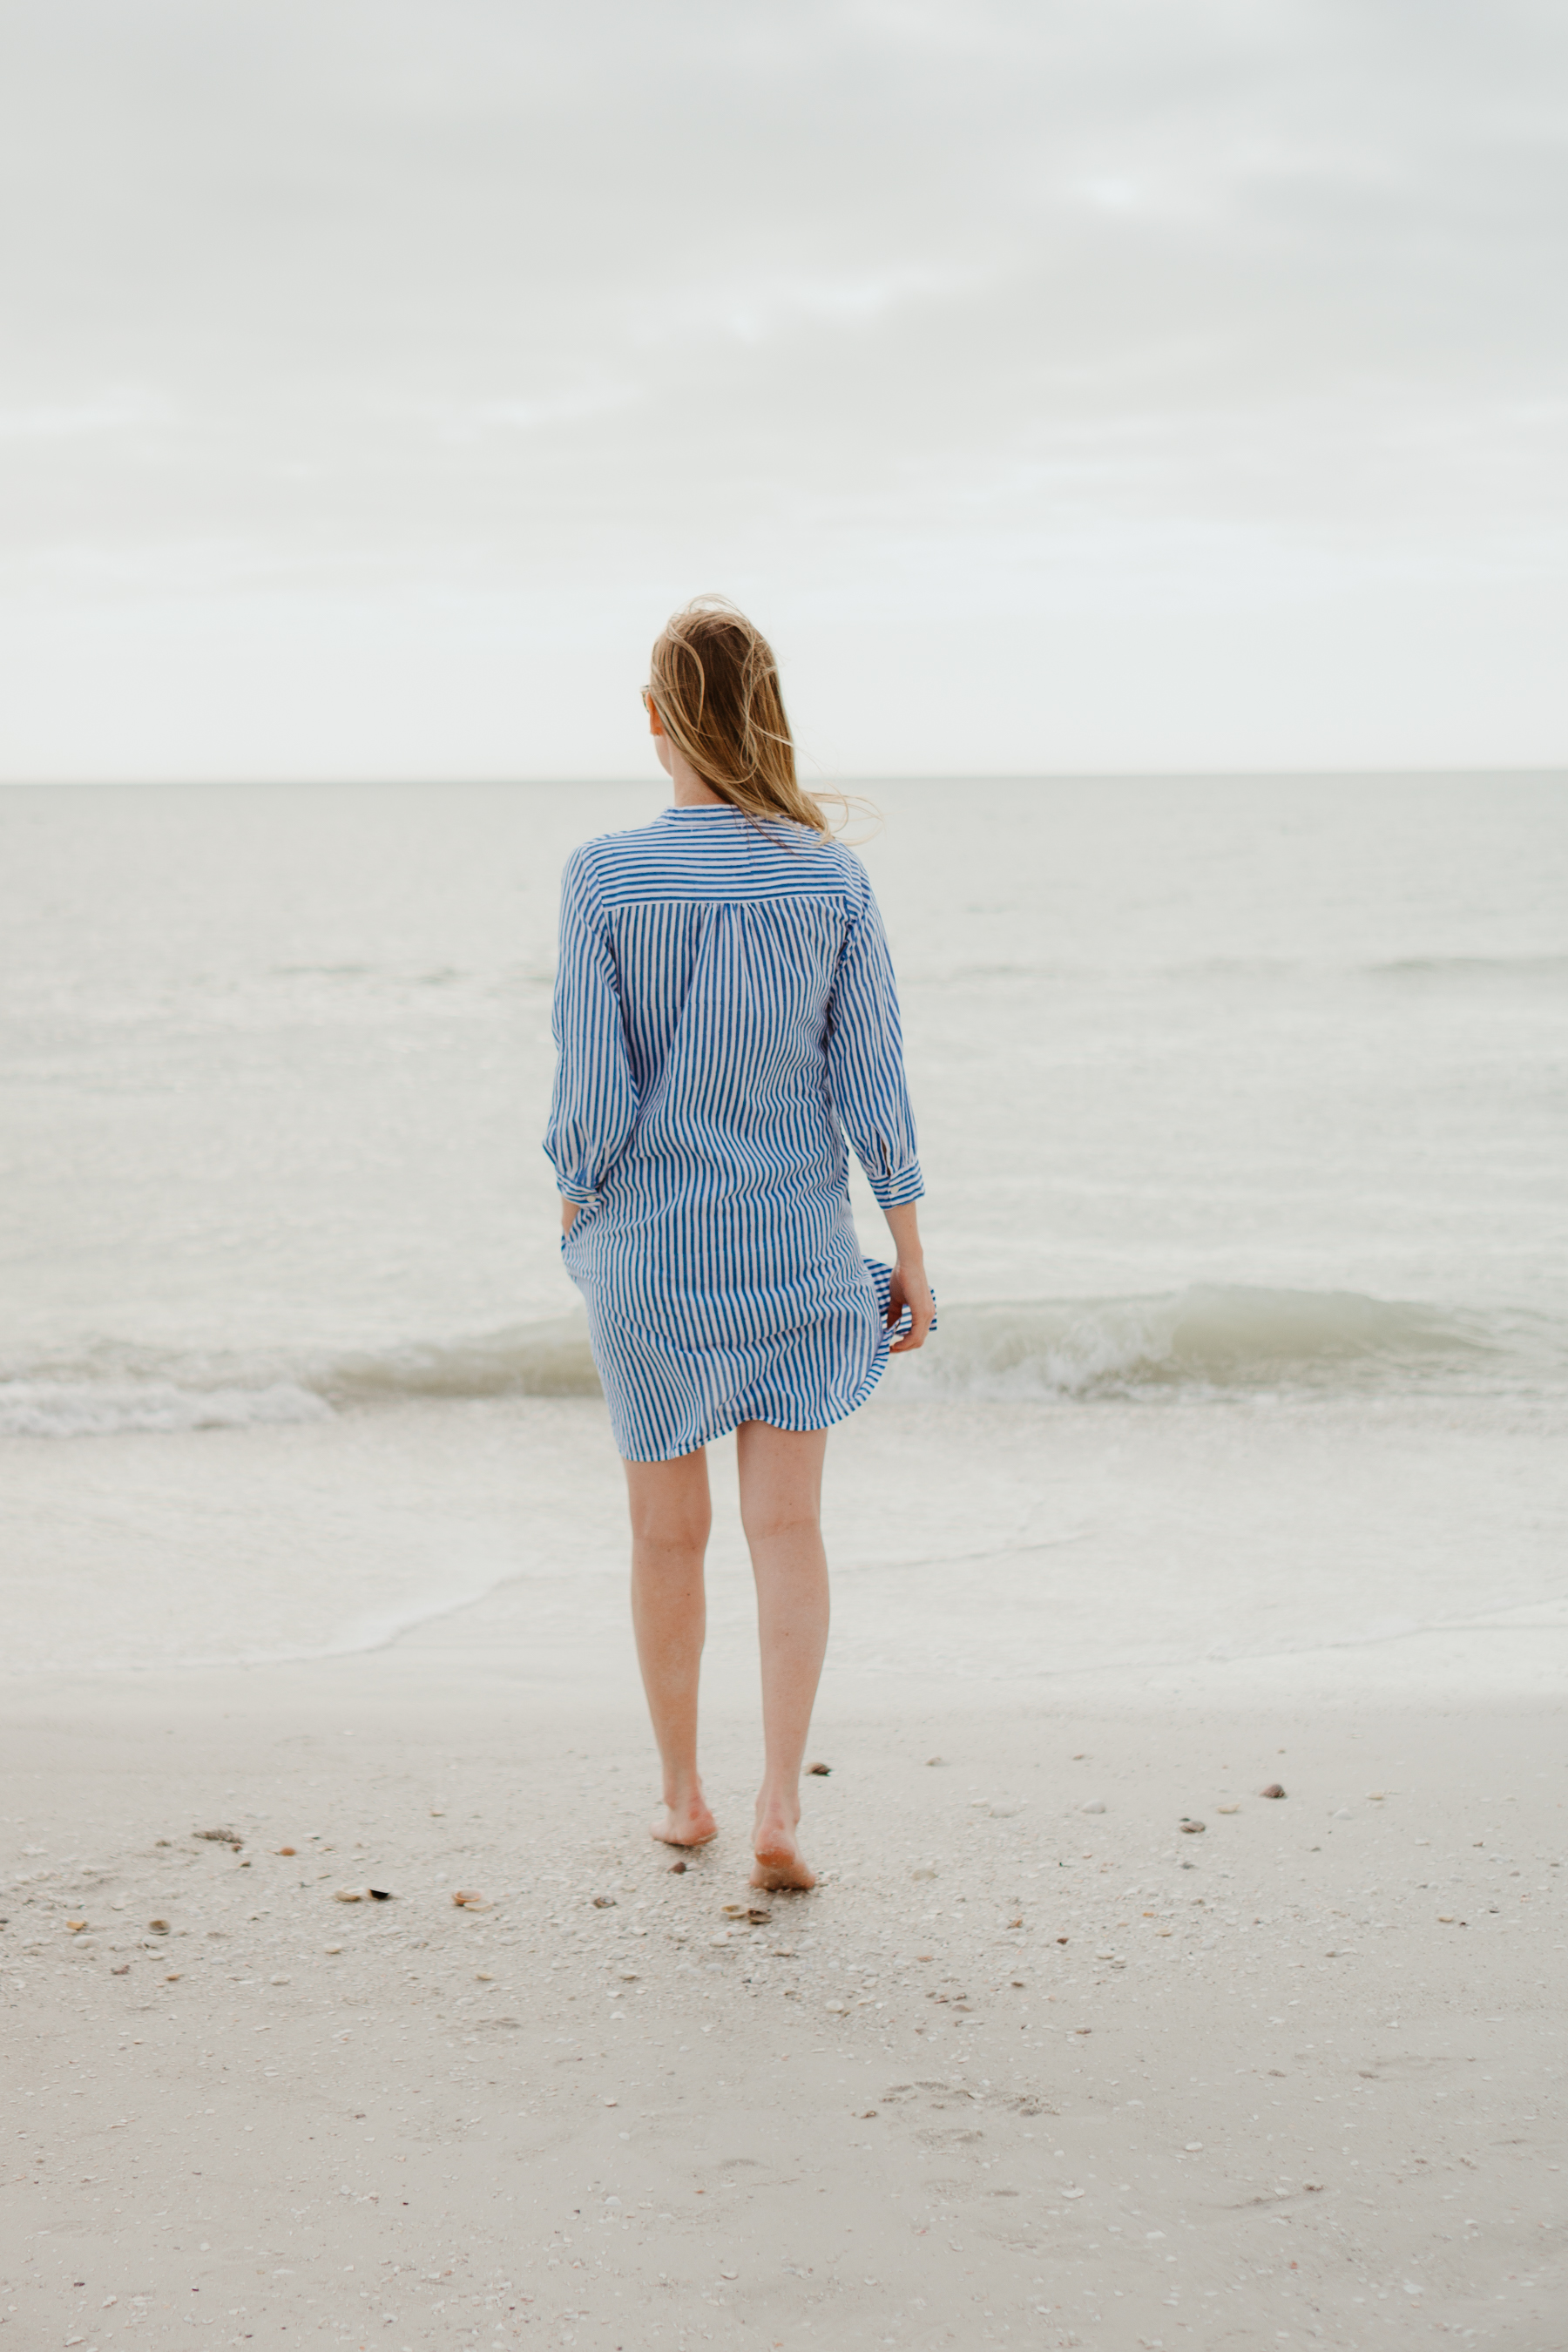 Kelly Larkin at the beach